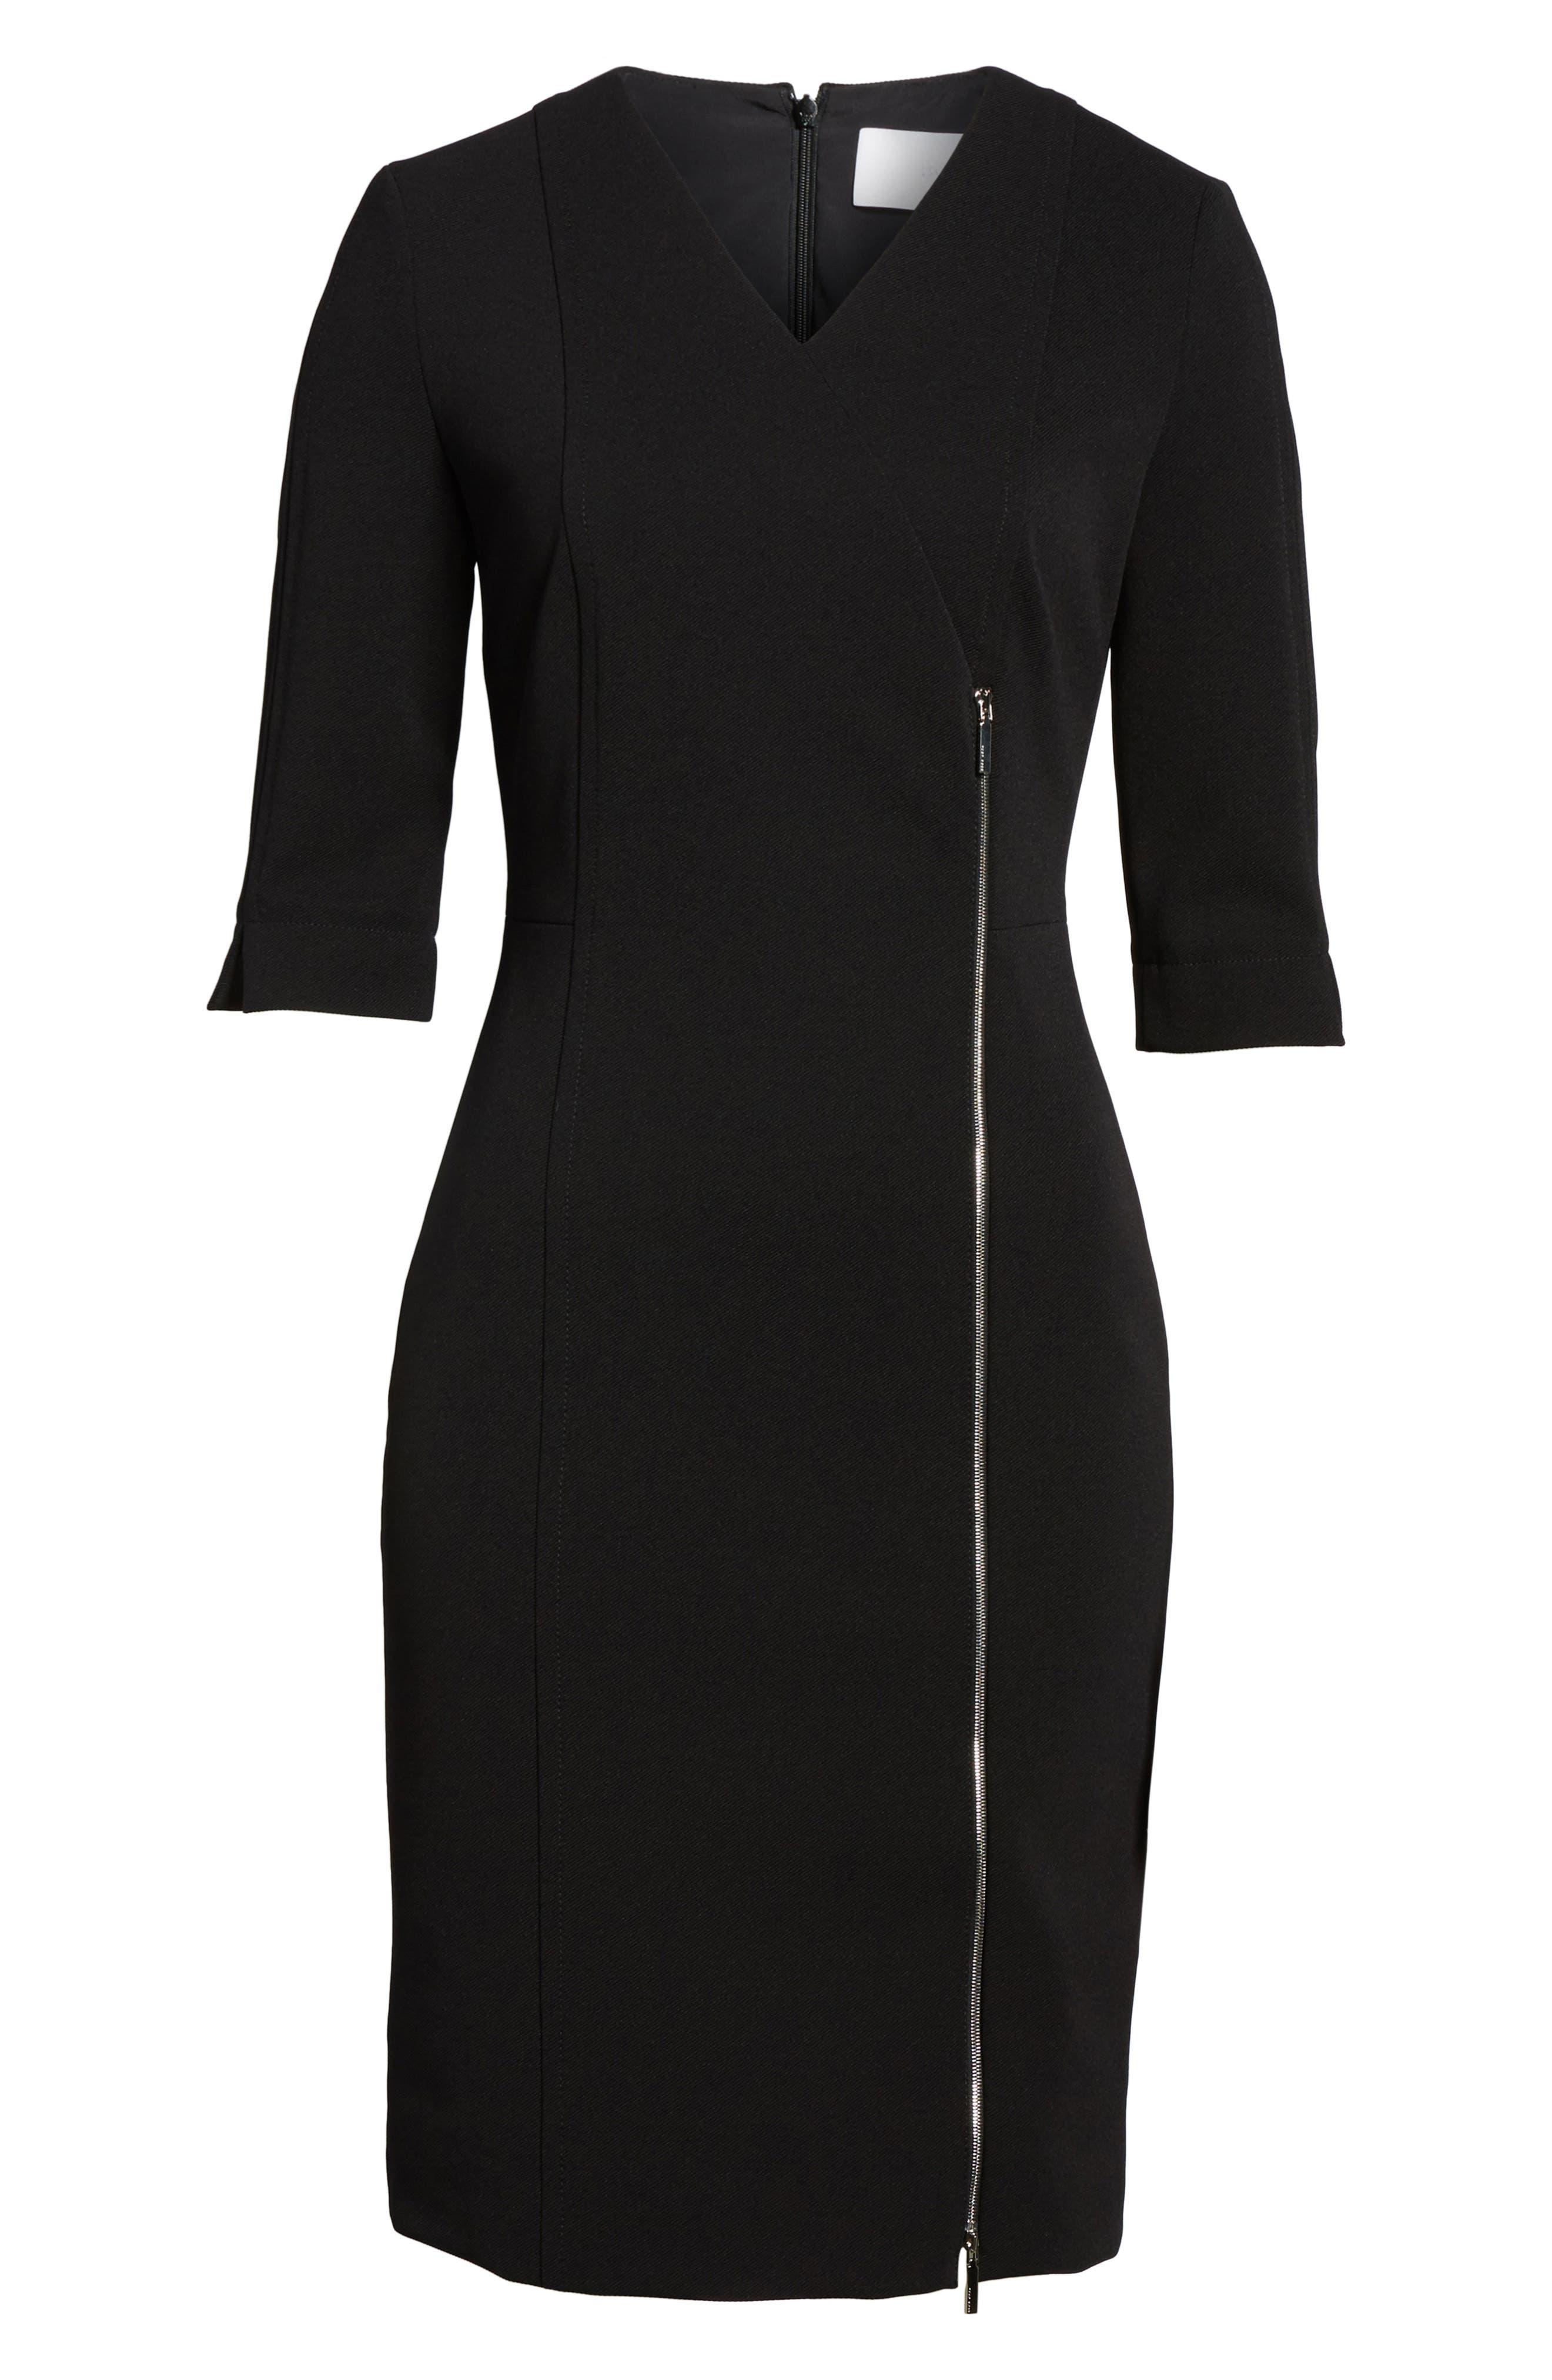 Deazema Twill Jersey Dress,                             Alternate thumbnail 6, color,                             001